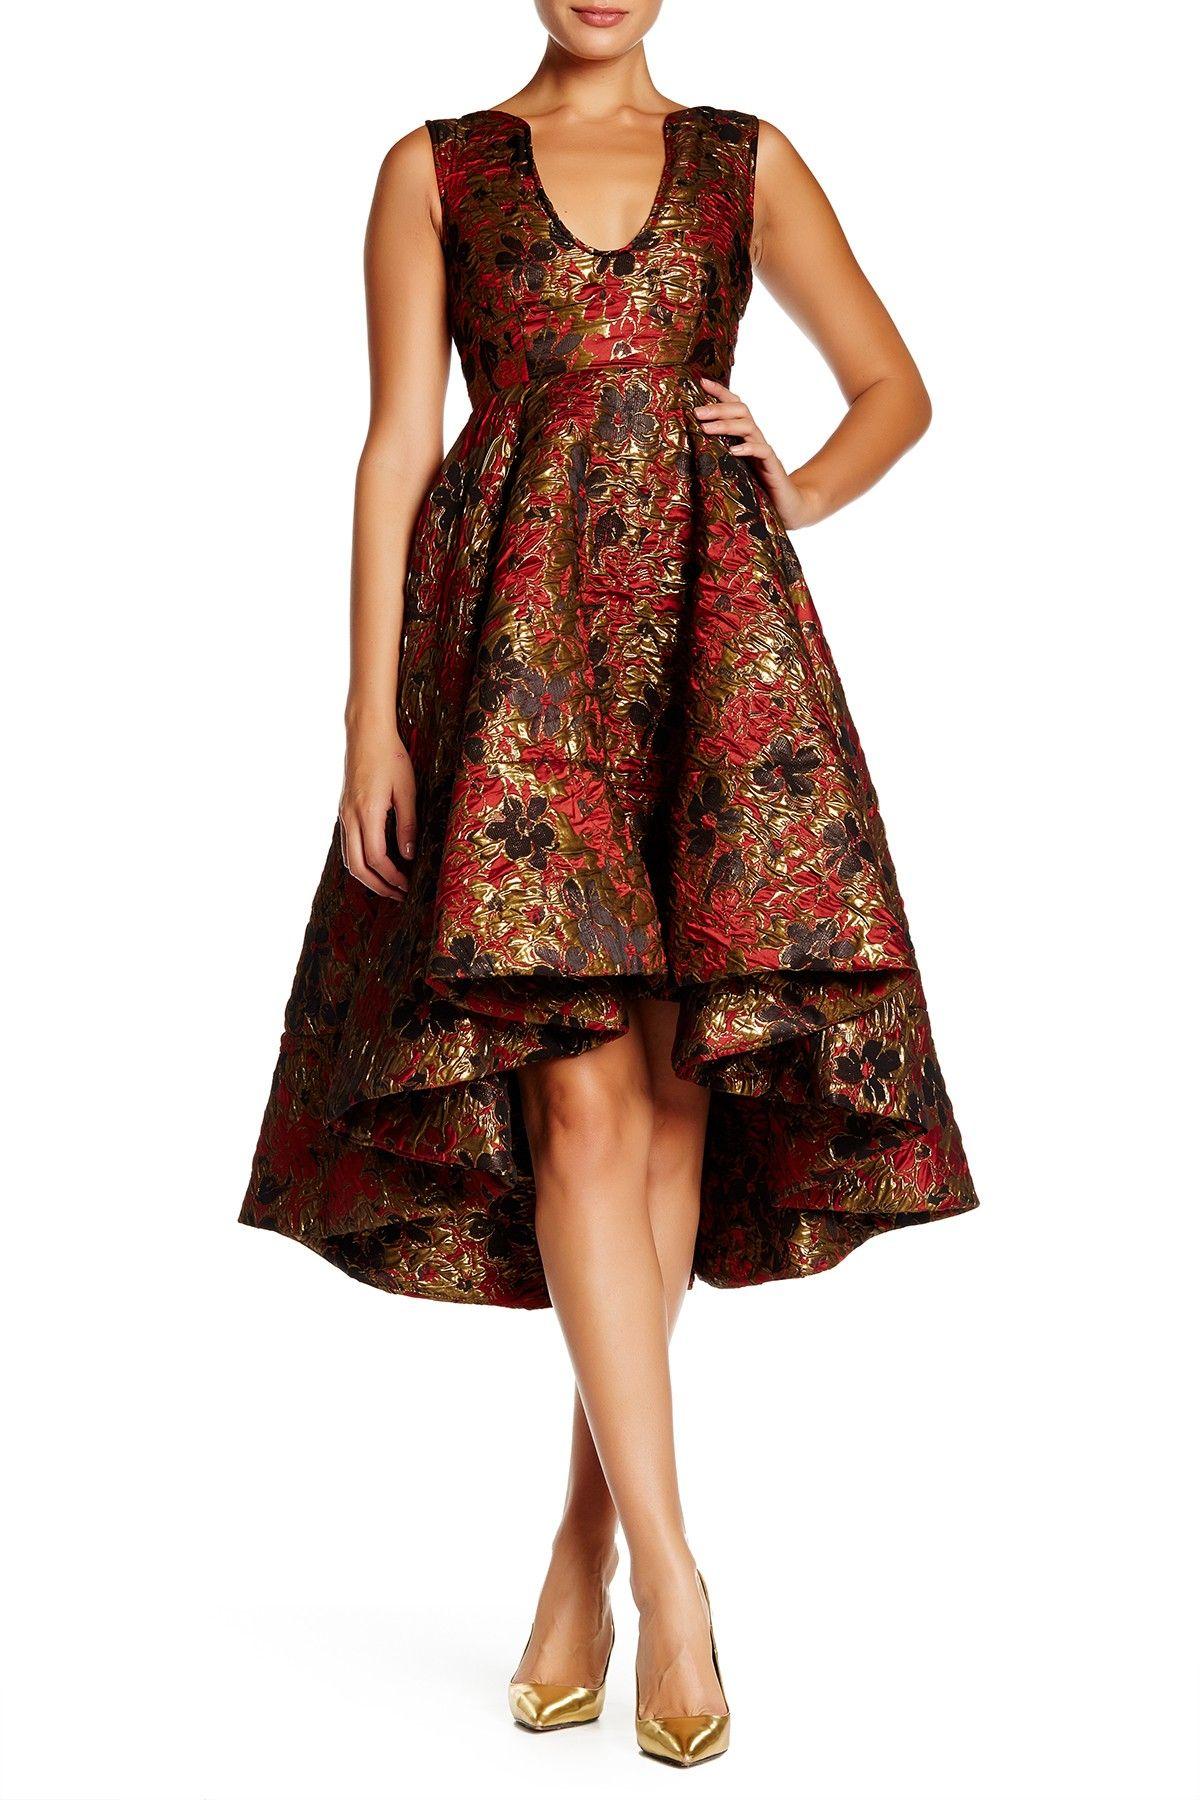 11+ Issue new york dress information